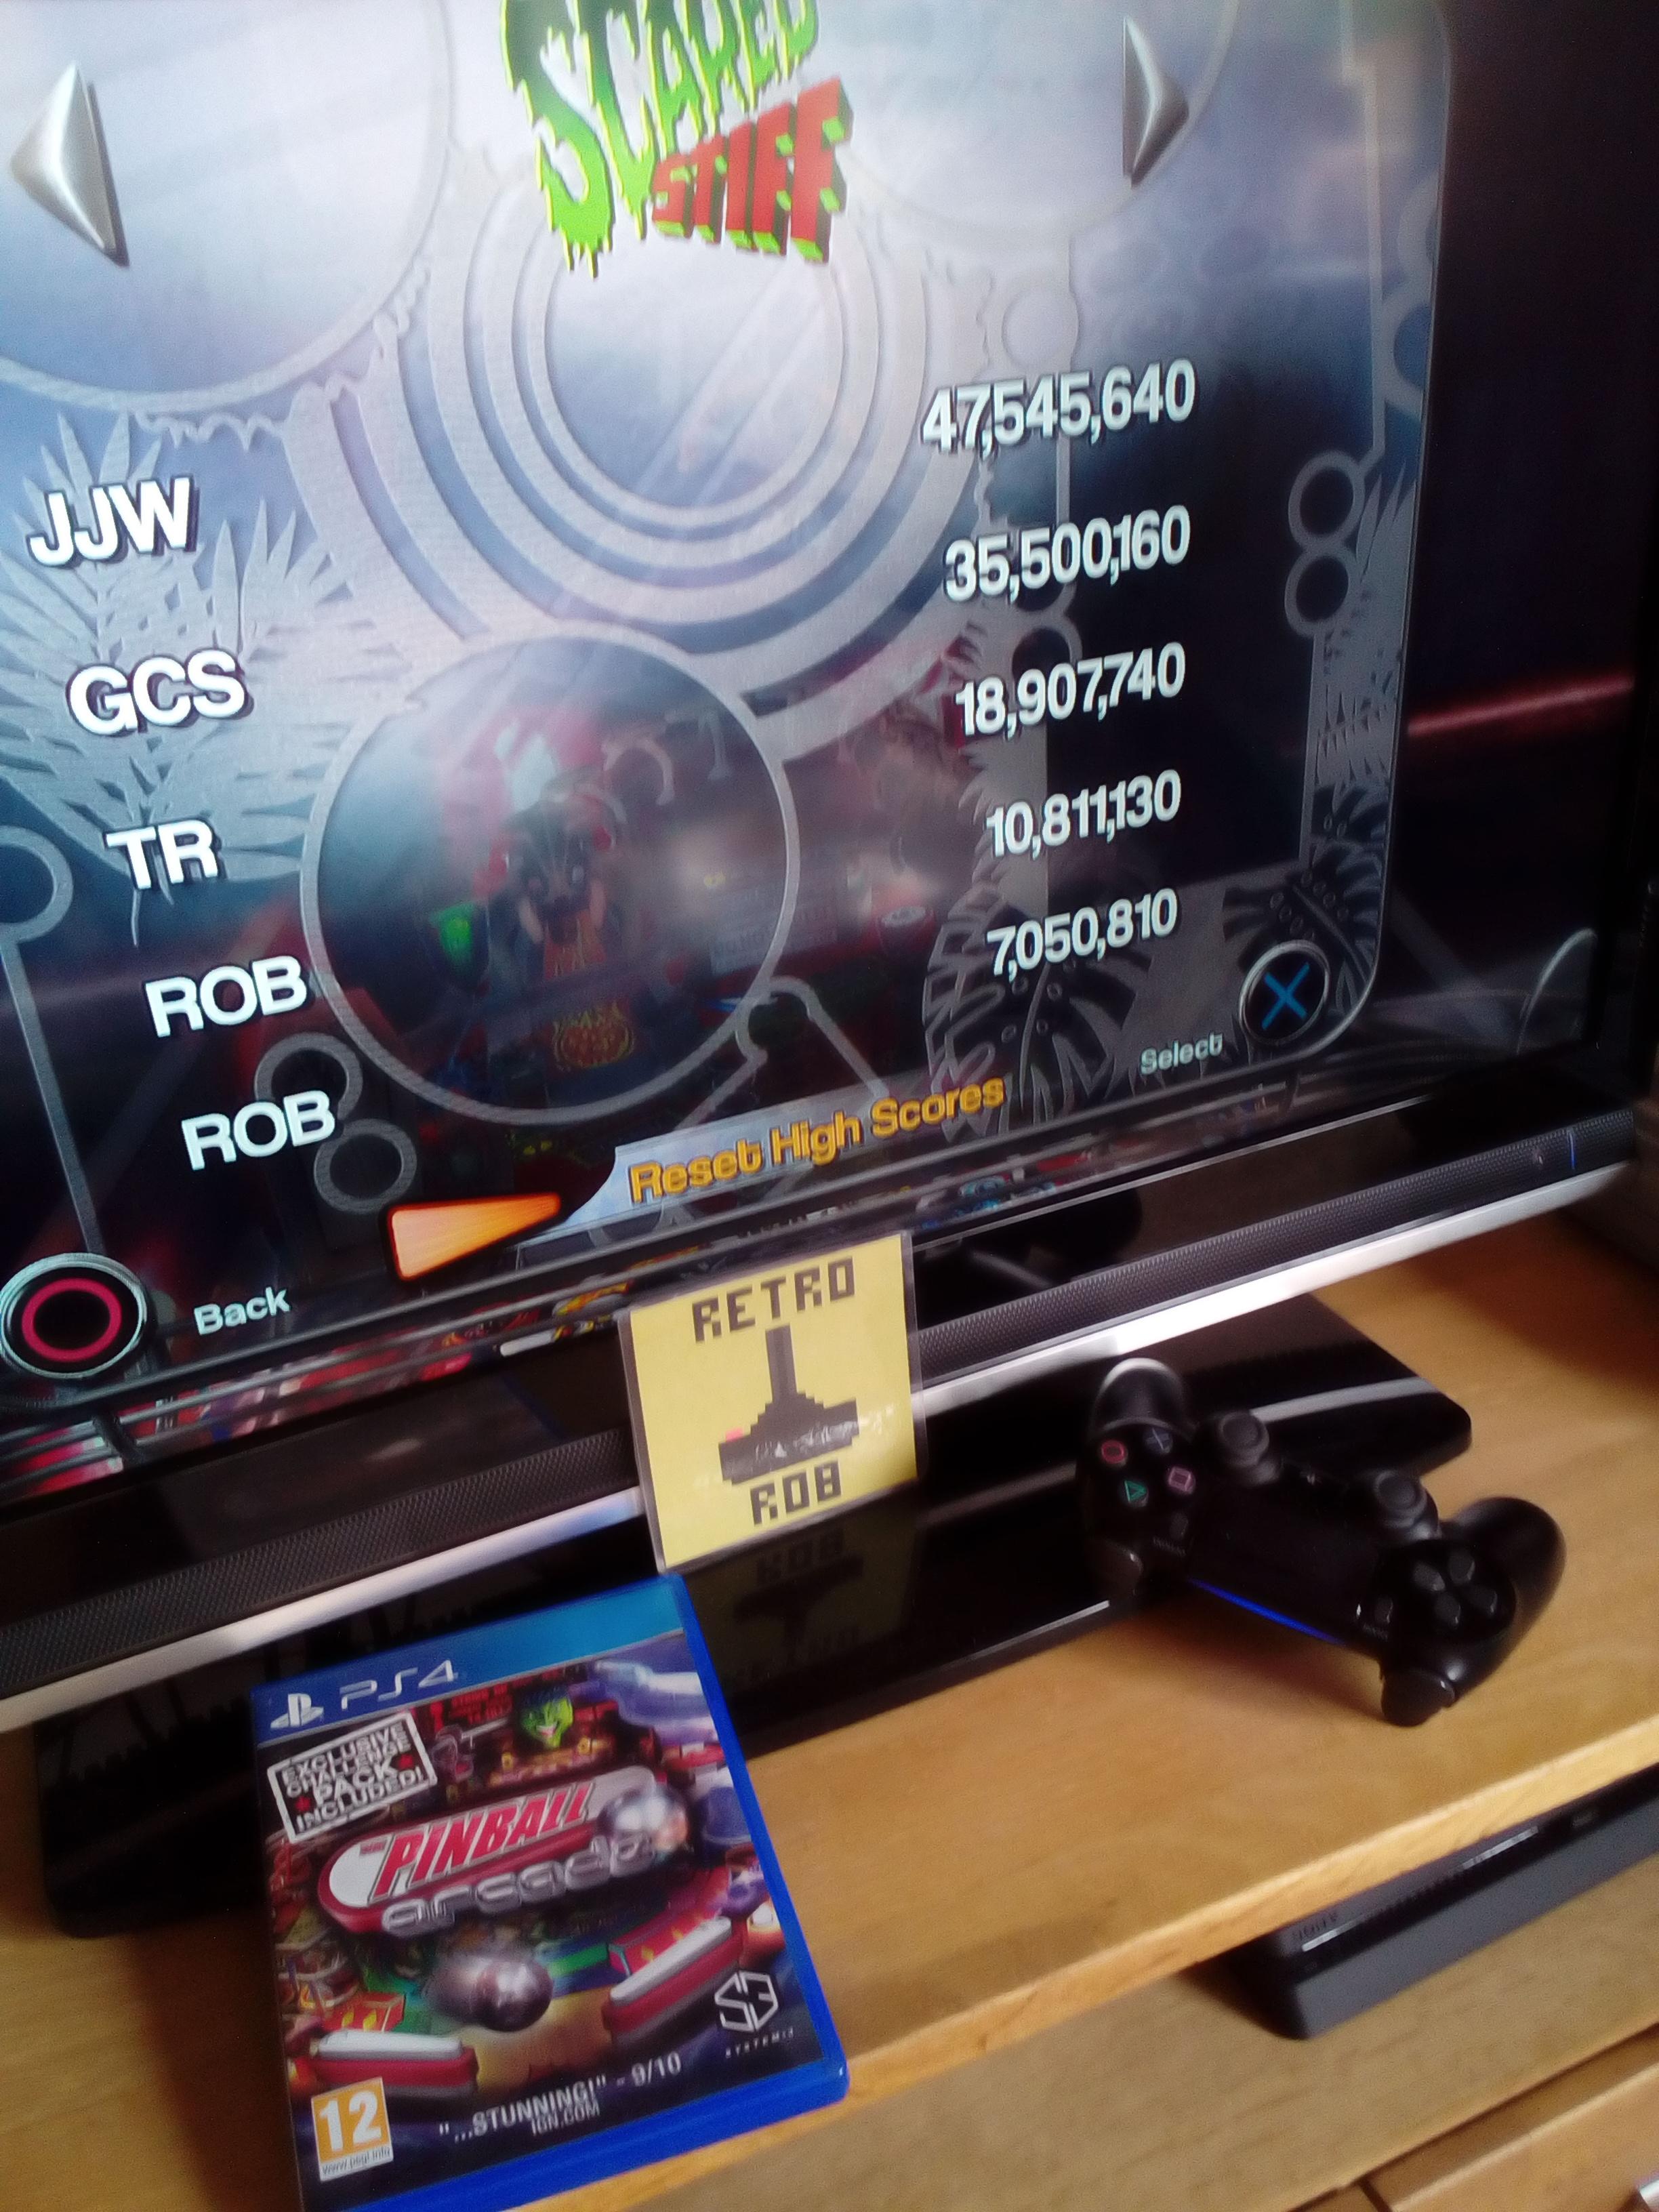 RetroRob: Pinball Arcade: Scared Stiff (Playstation 4) 10,811,130 points on 2020-10-11 11:20:37